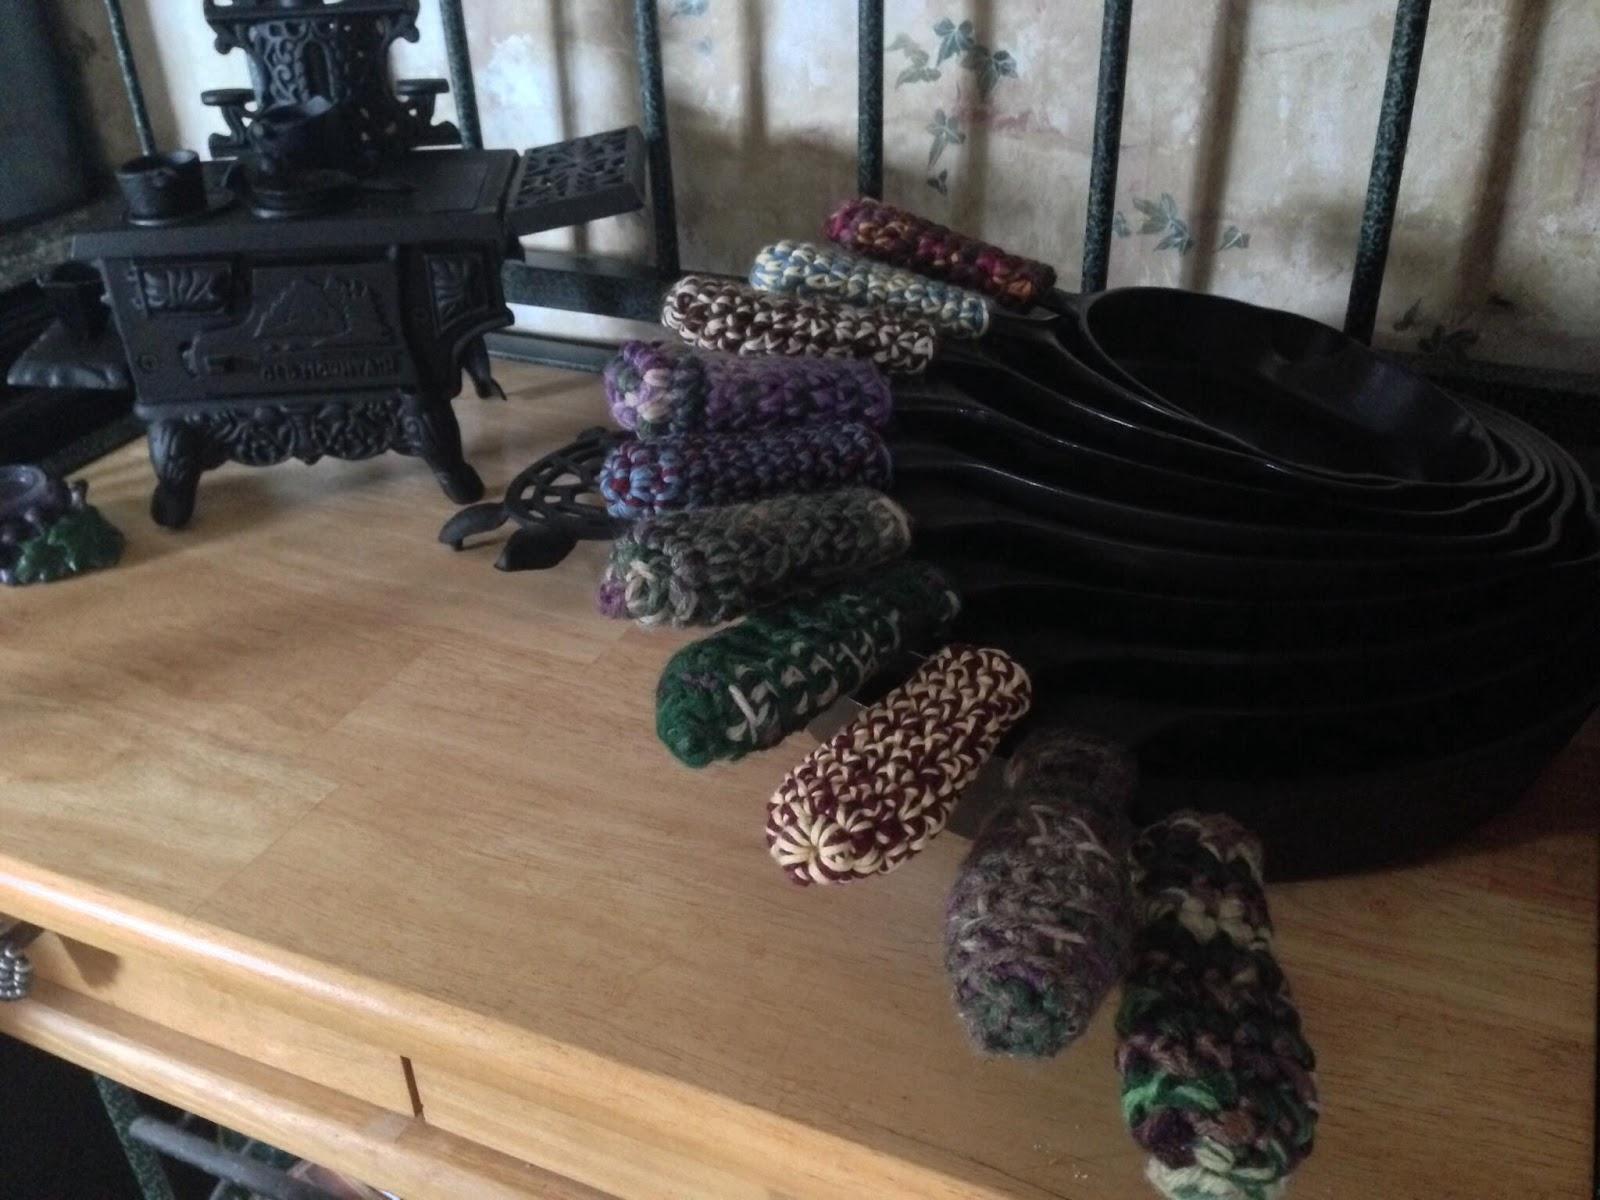 Adventures In Crochet Cast Iron Skillet Handle Cover